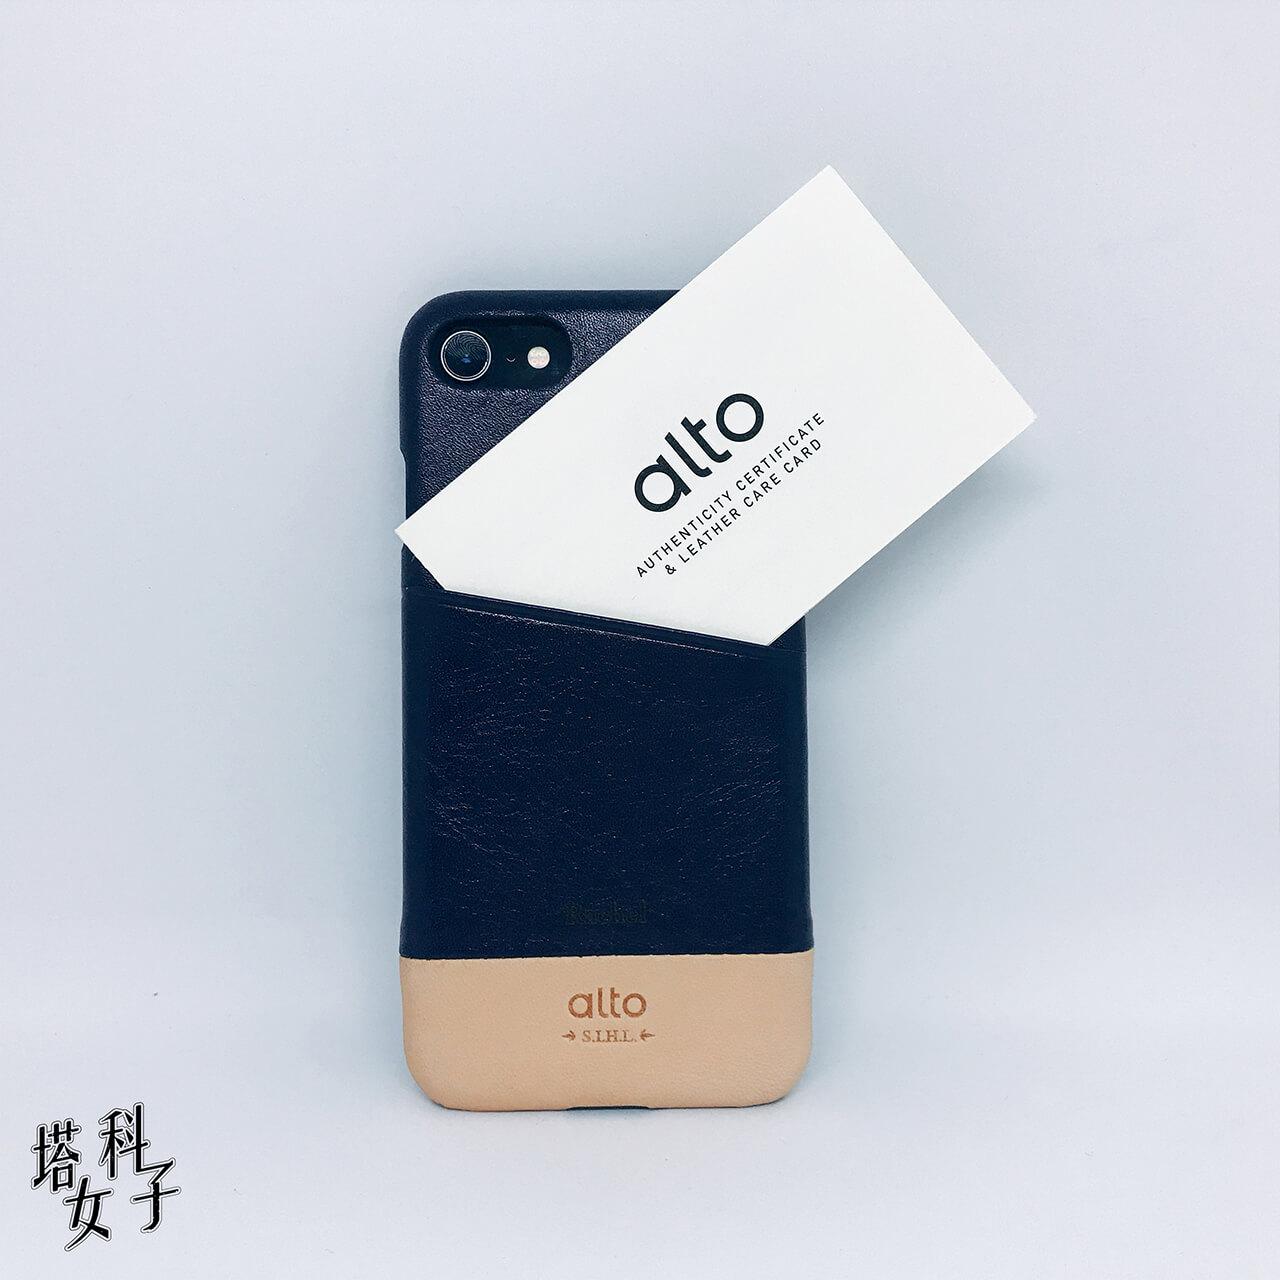 iPhone 手機殼開箱 - alto 卡層